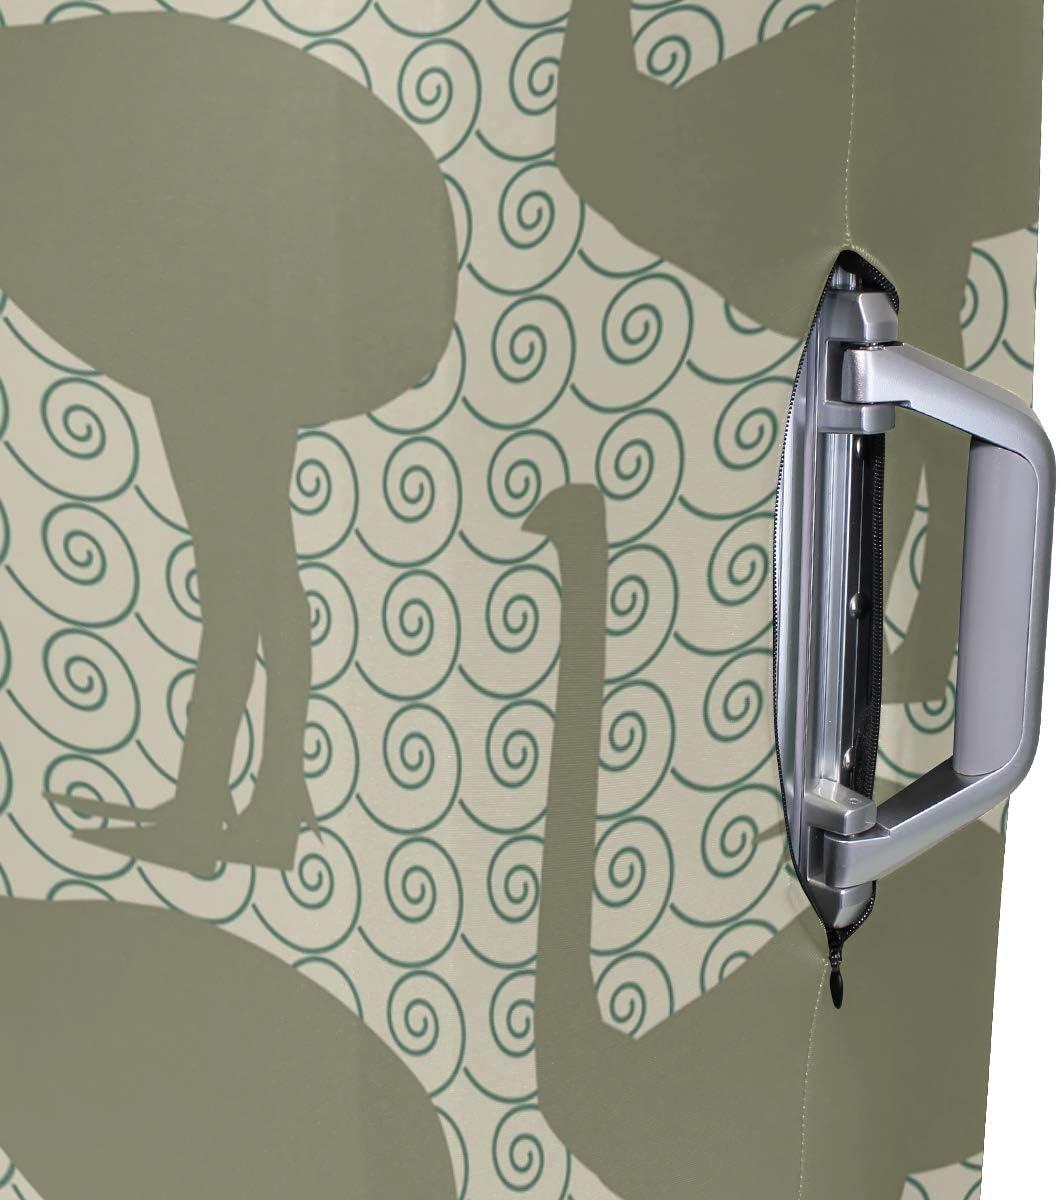 MALPLENA Extinct Animals Inspired Fabric Designs Luggage Protector Suitcase Cover